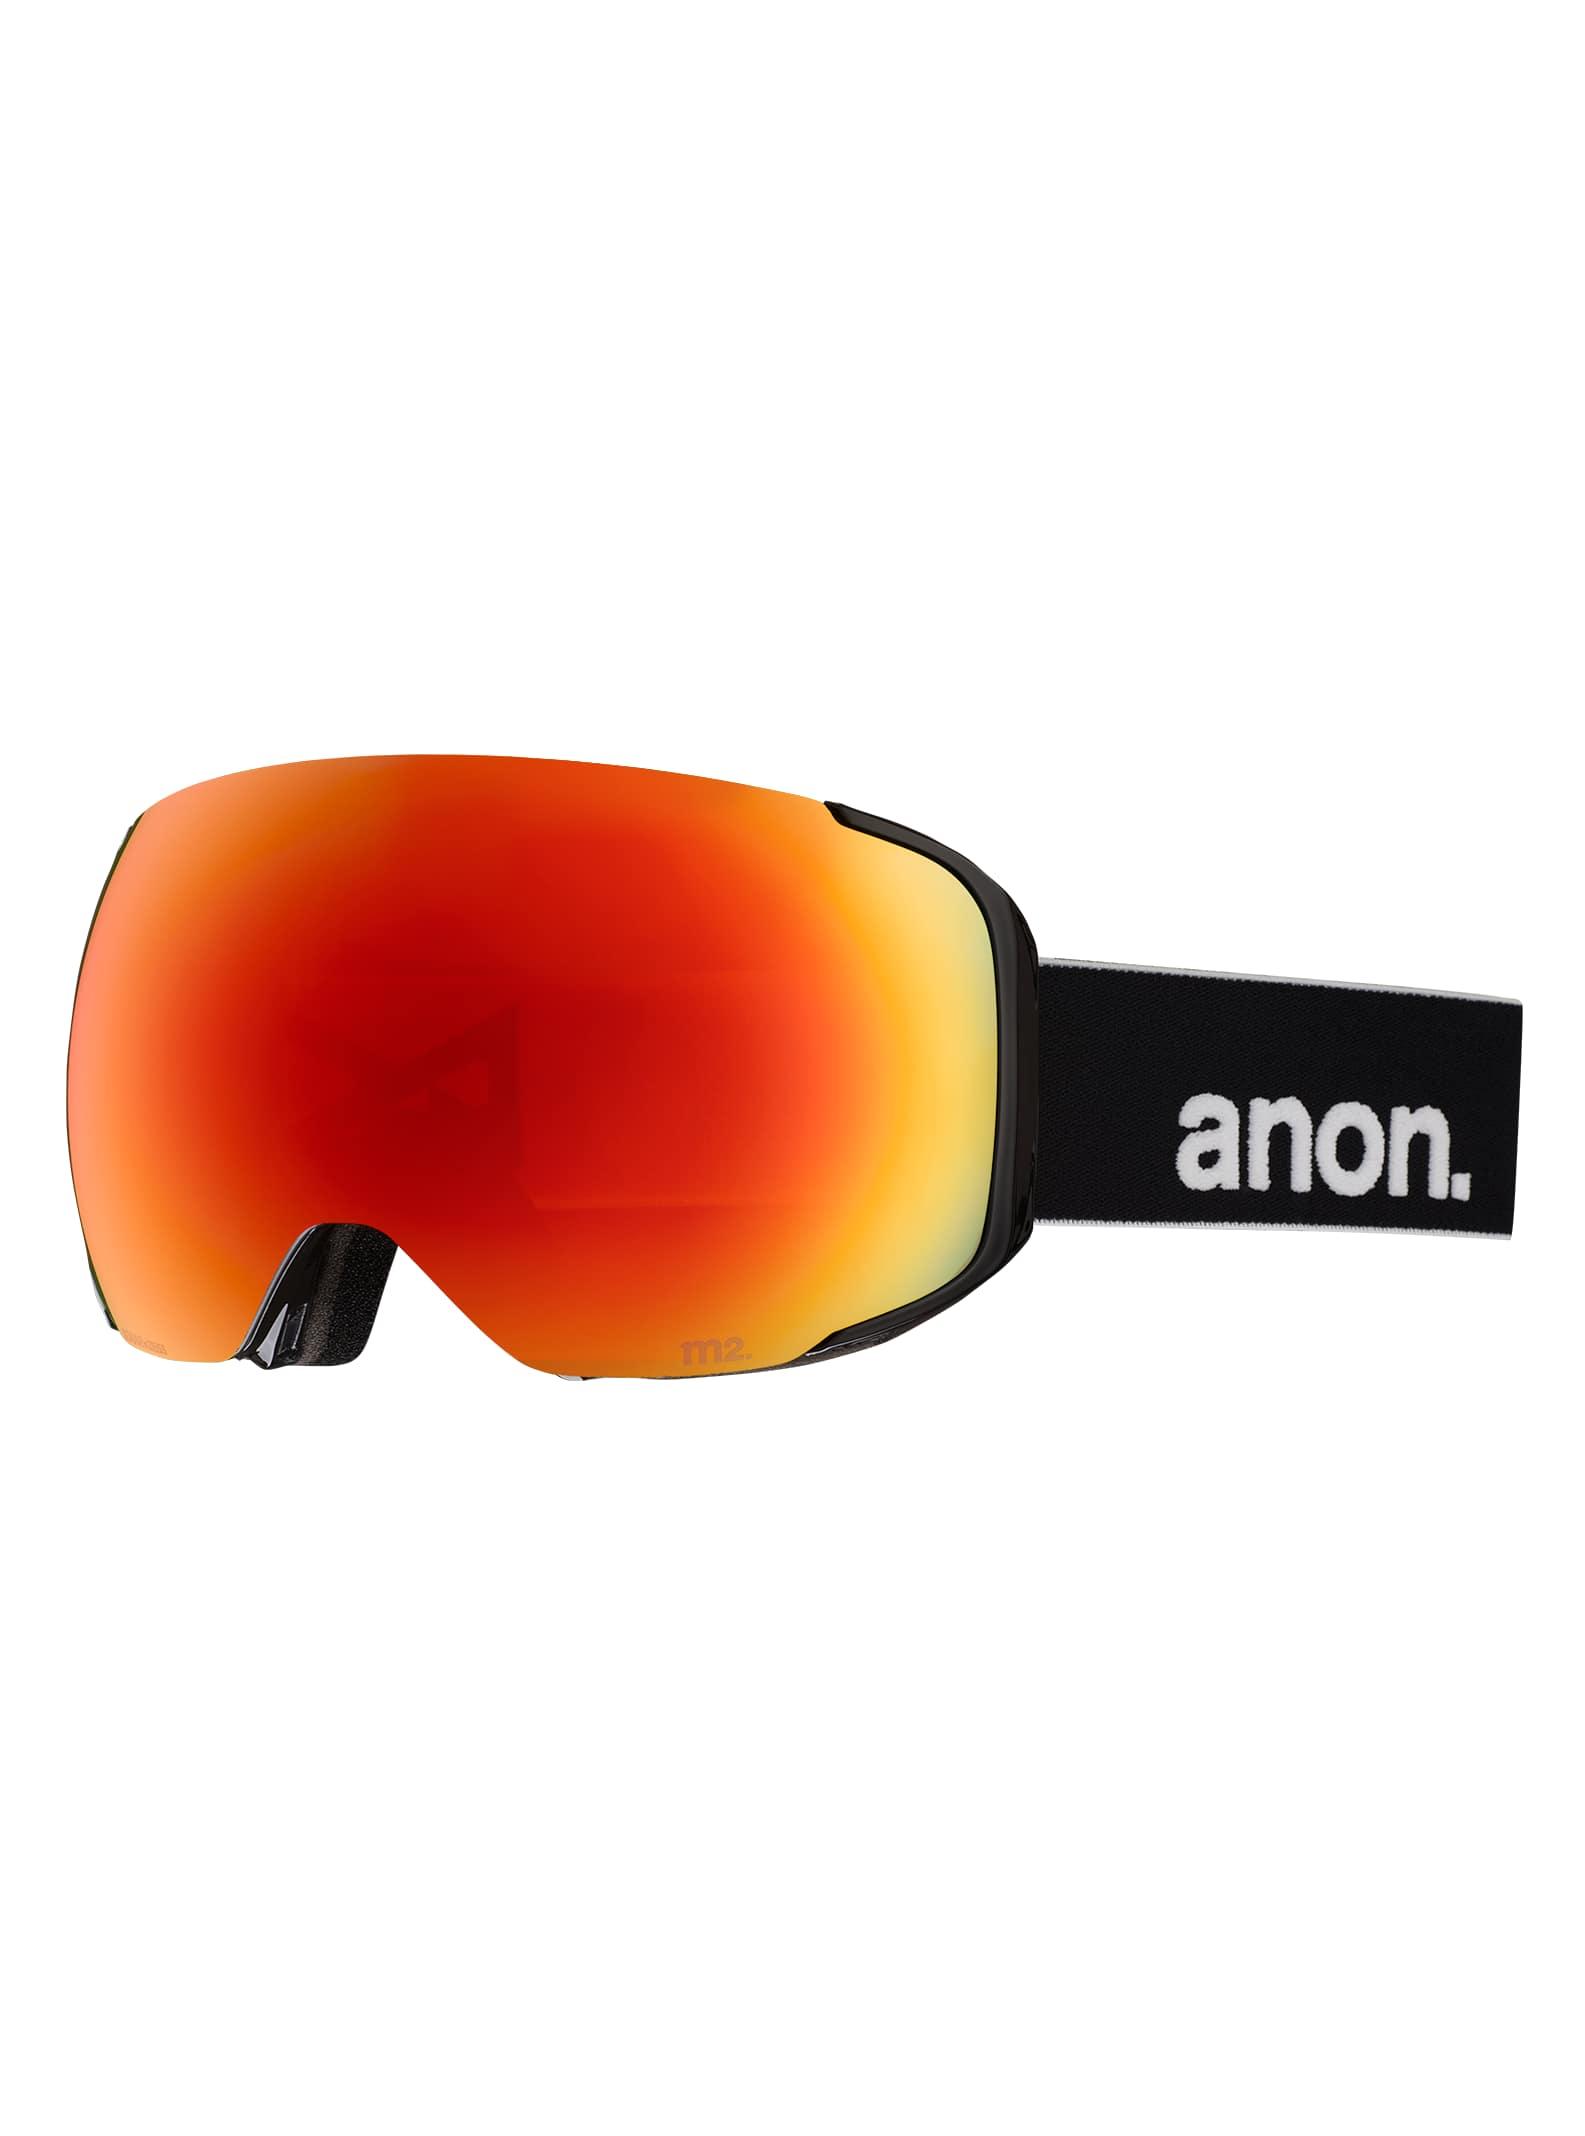 b3a5b9bf8d0f Men s Anon M2 Goggle + Spare Lens + MFI